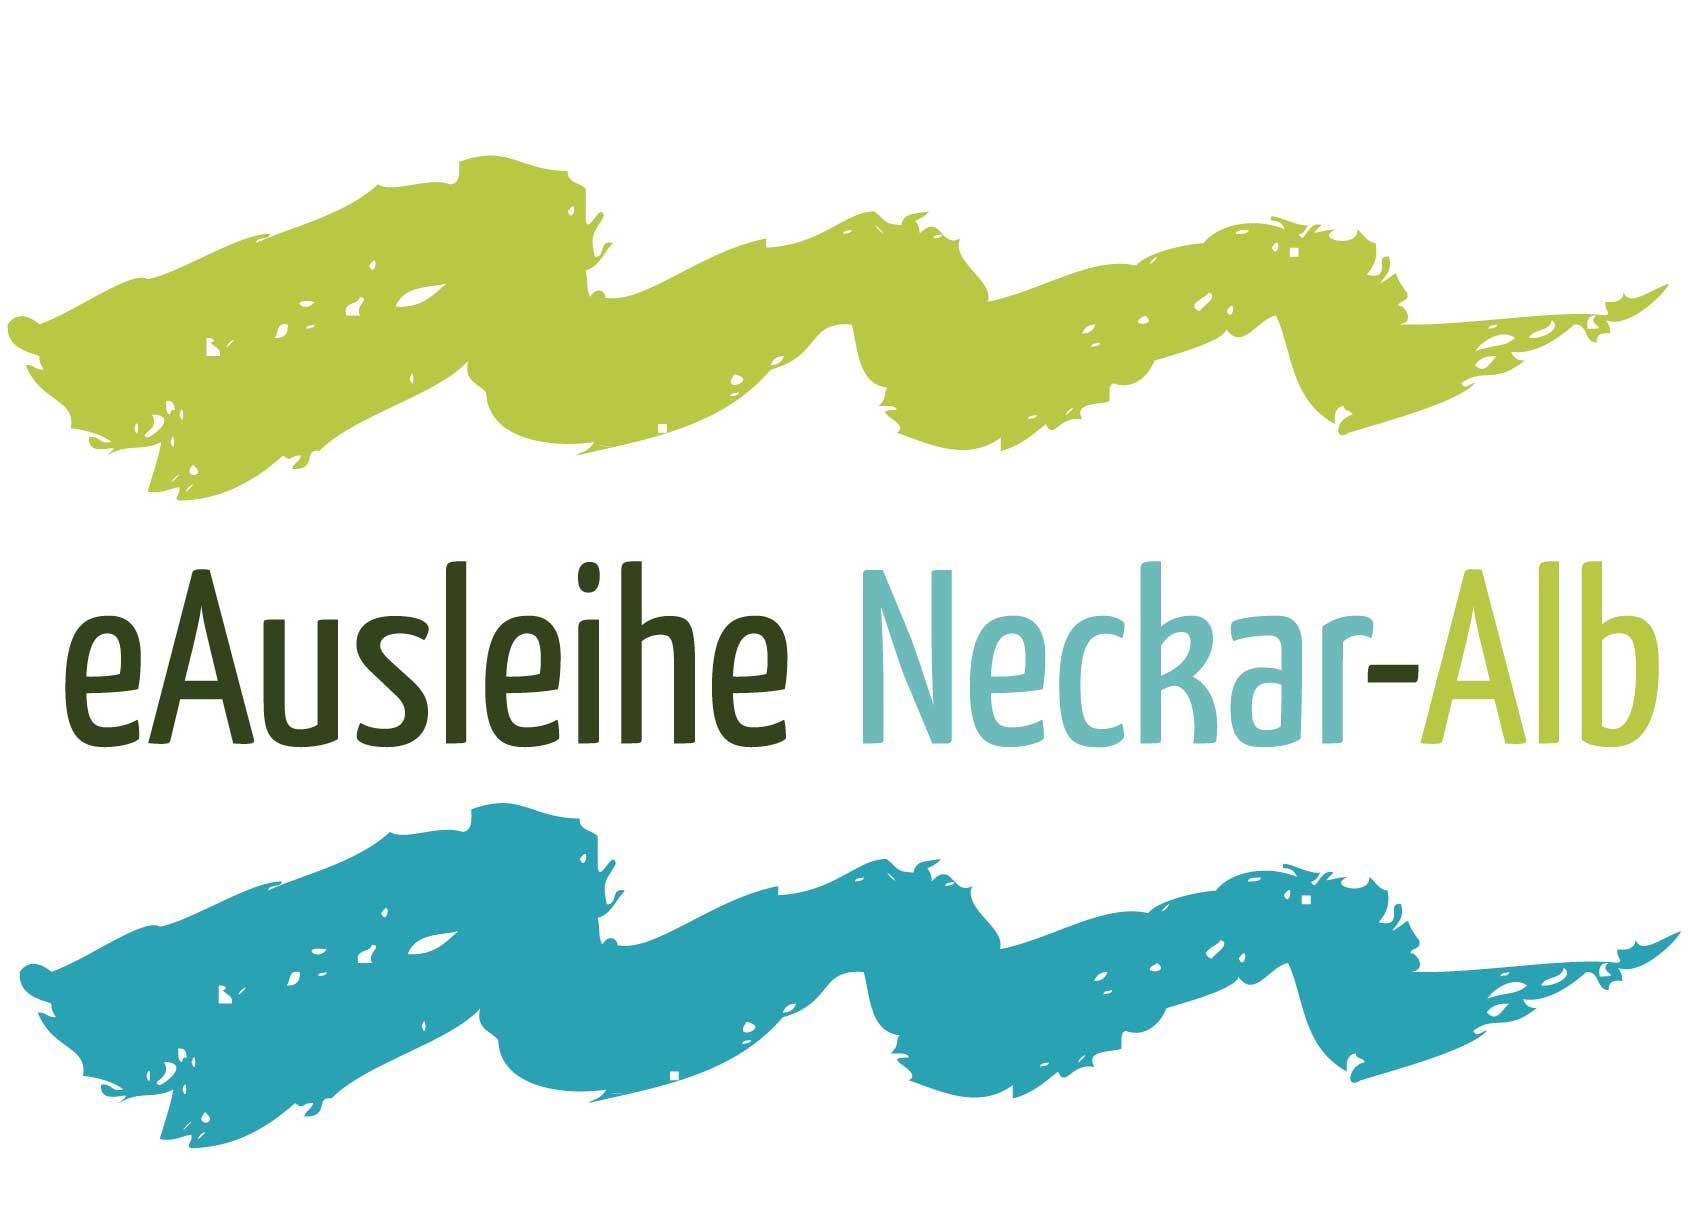 eAusleihe Neckar-Alb